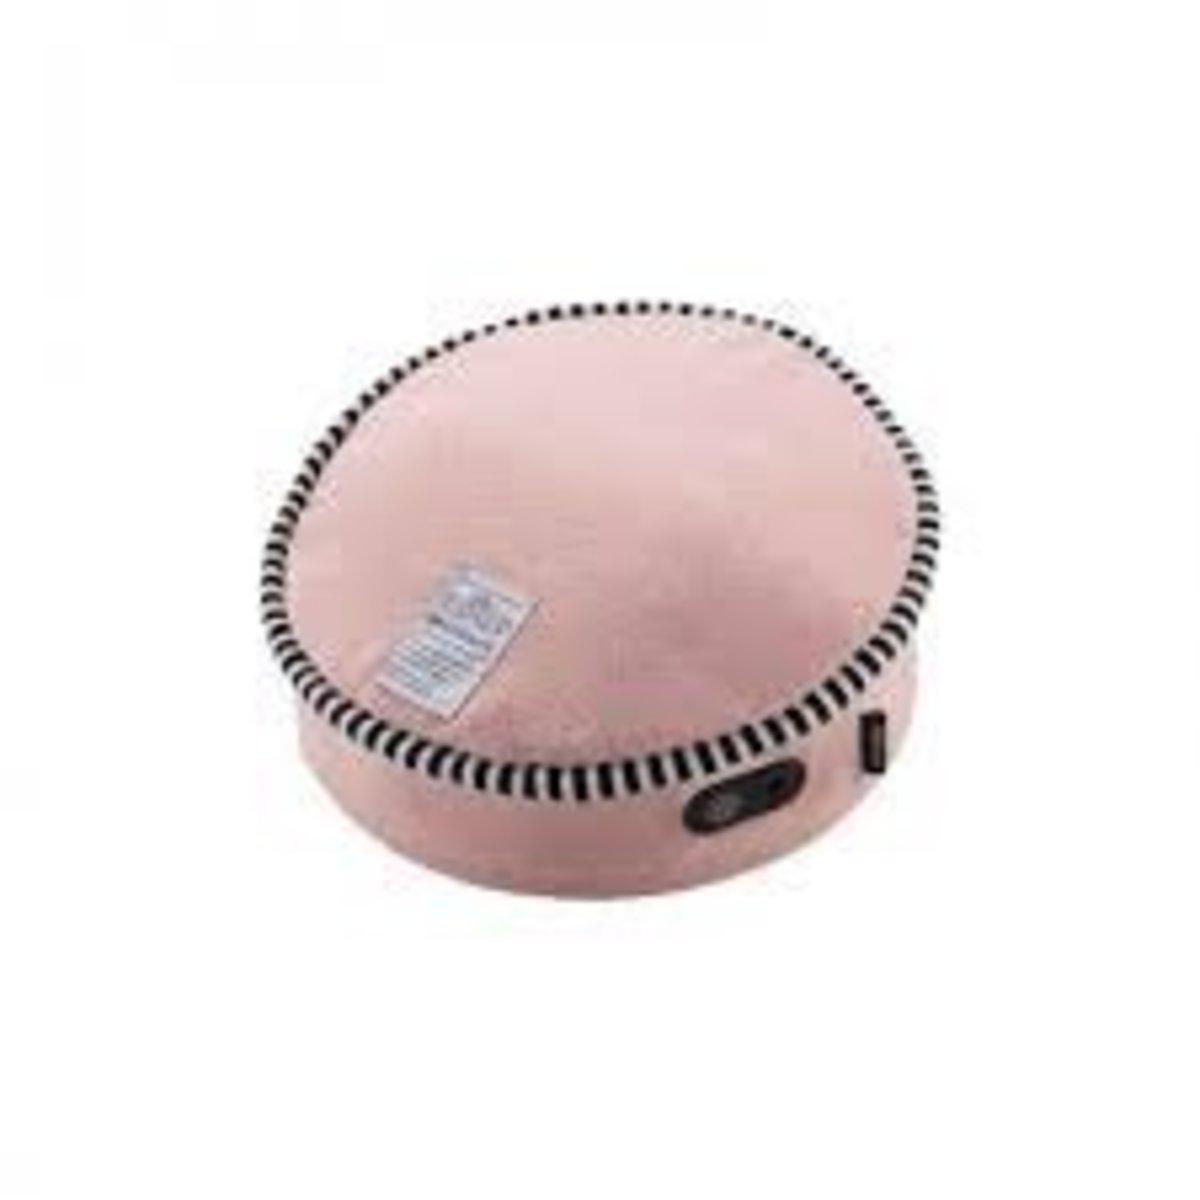 [HK Warranty] Lightweight multi Function foot massager SS AX-HXL194 Pink